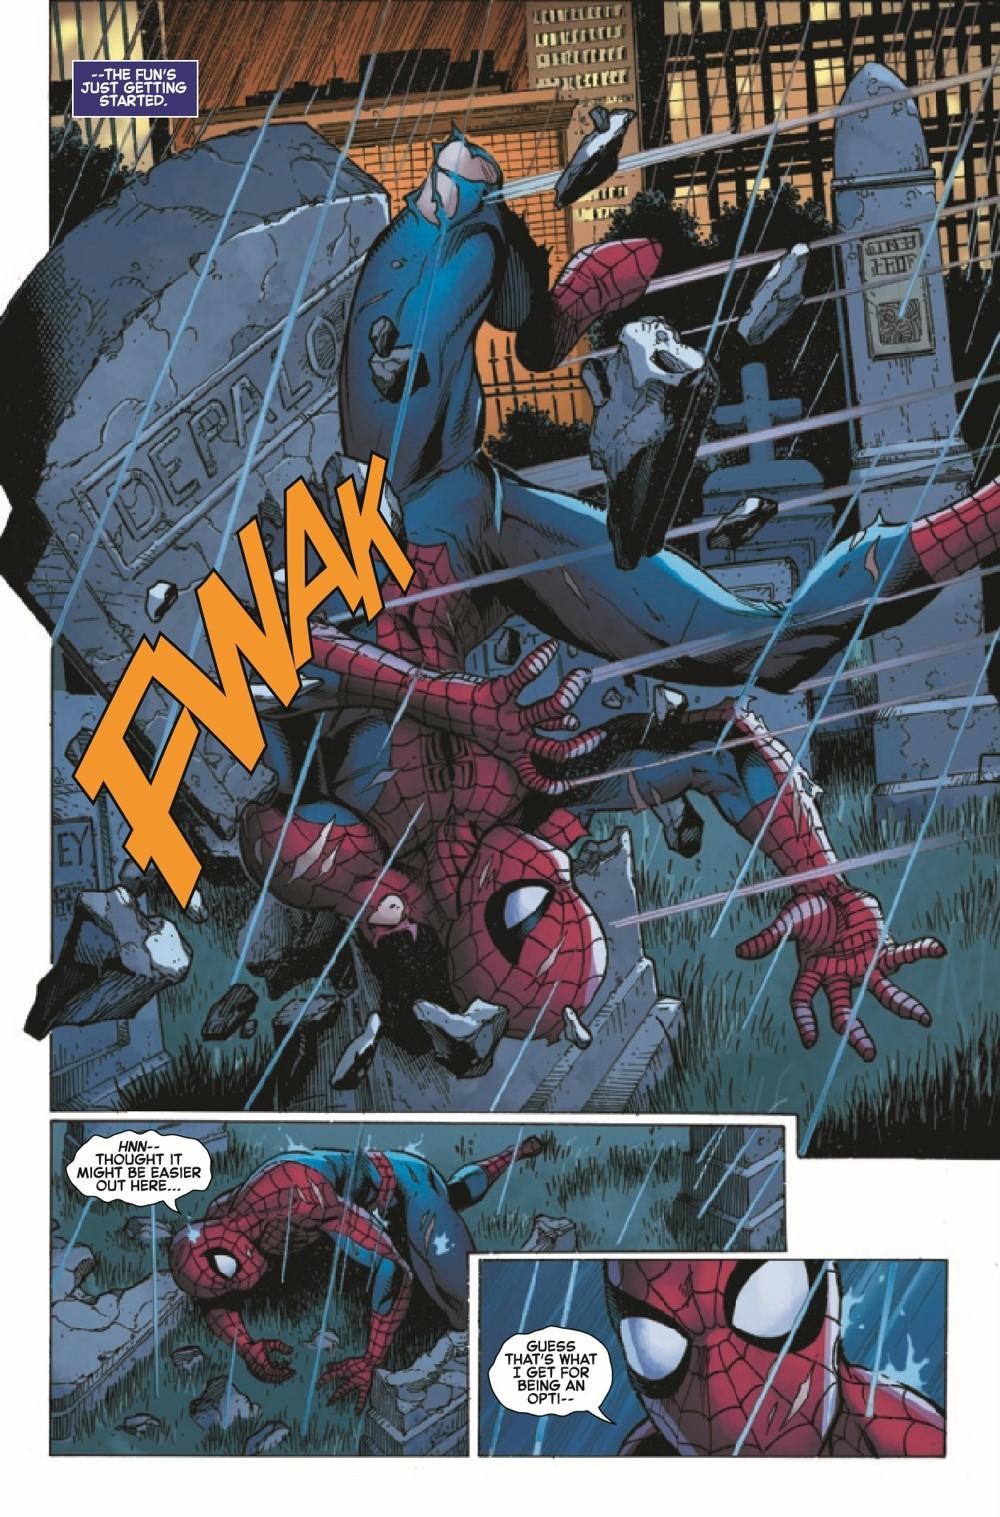 SINISTERWAR2021002_Preview-4 ComicList Previews: SINISTER WAR #2 (OF 4)